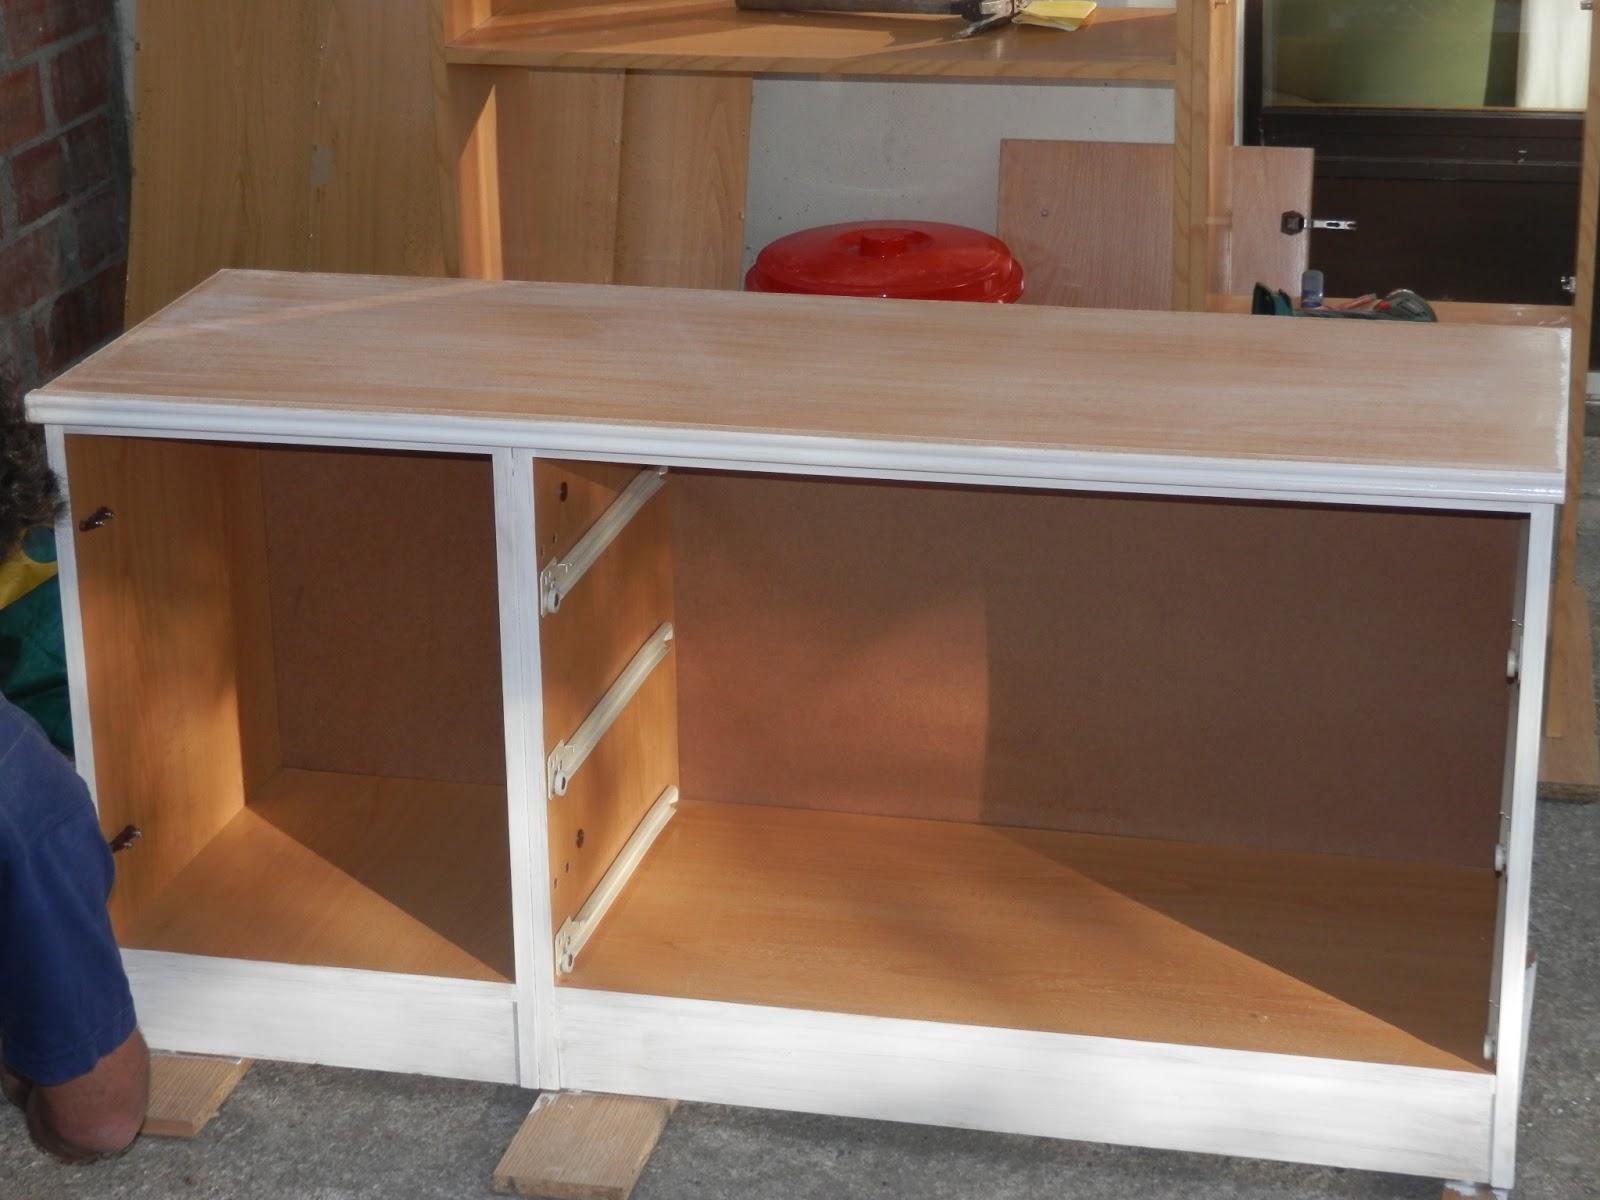 Aprovechando pintar mueble de melamina Programa para hacer muebles de melamina